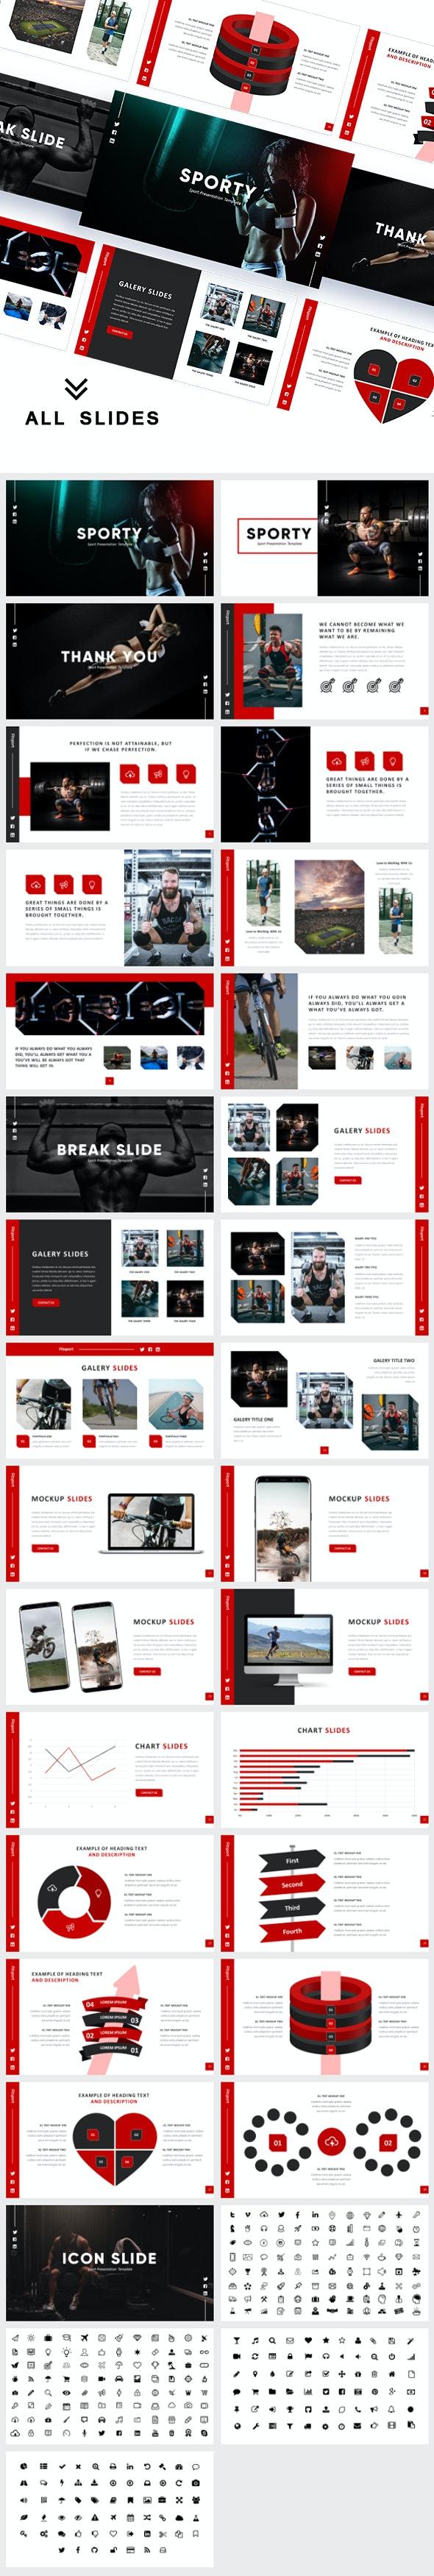 Fitsport - Gym, Fitness & Sports Google Slides Template - Google Slides Presentation Templates